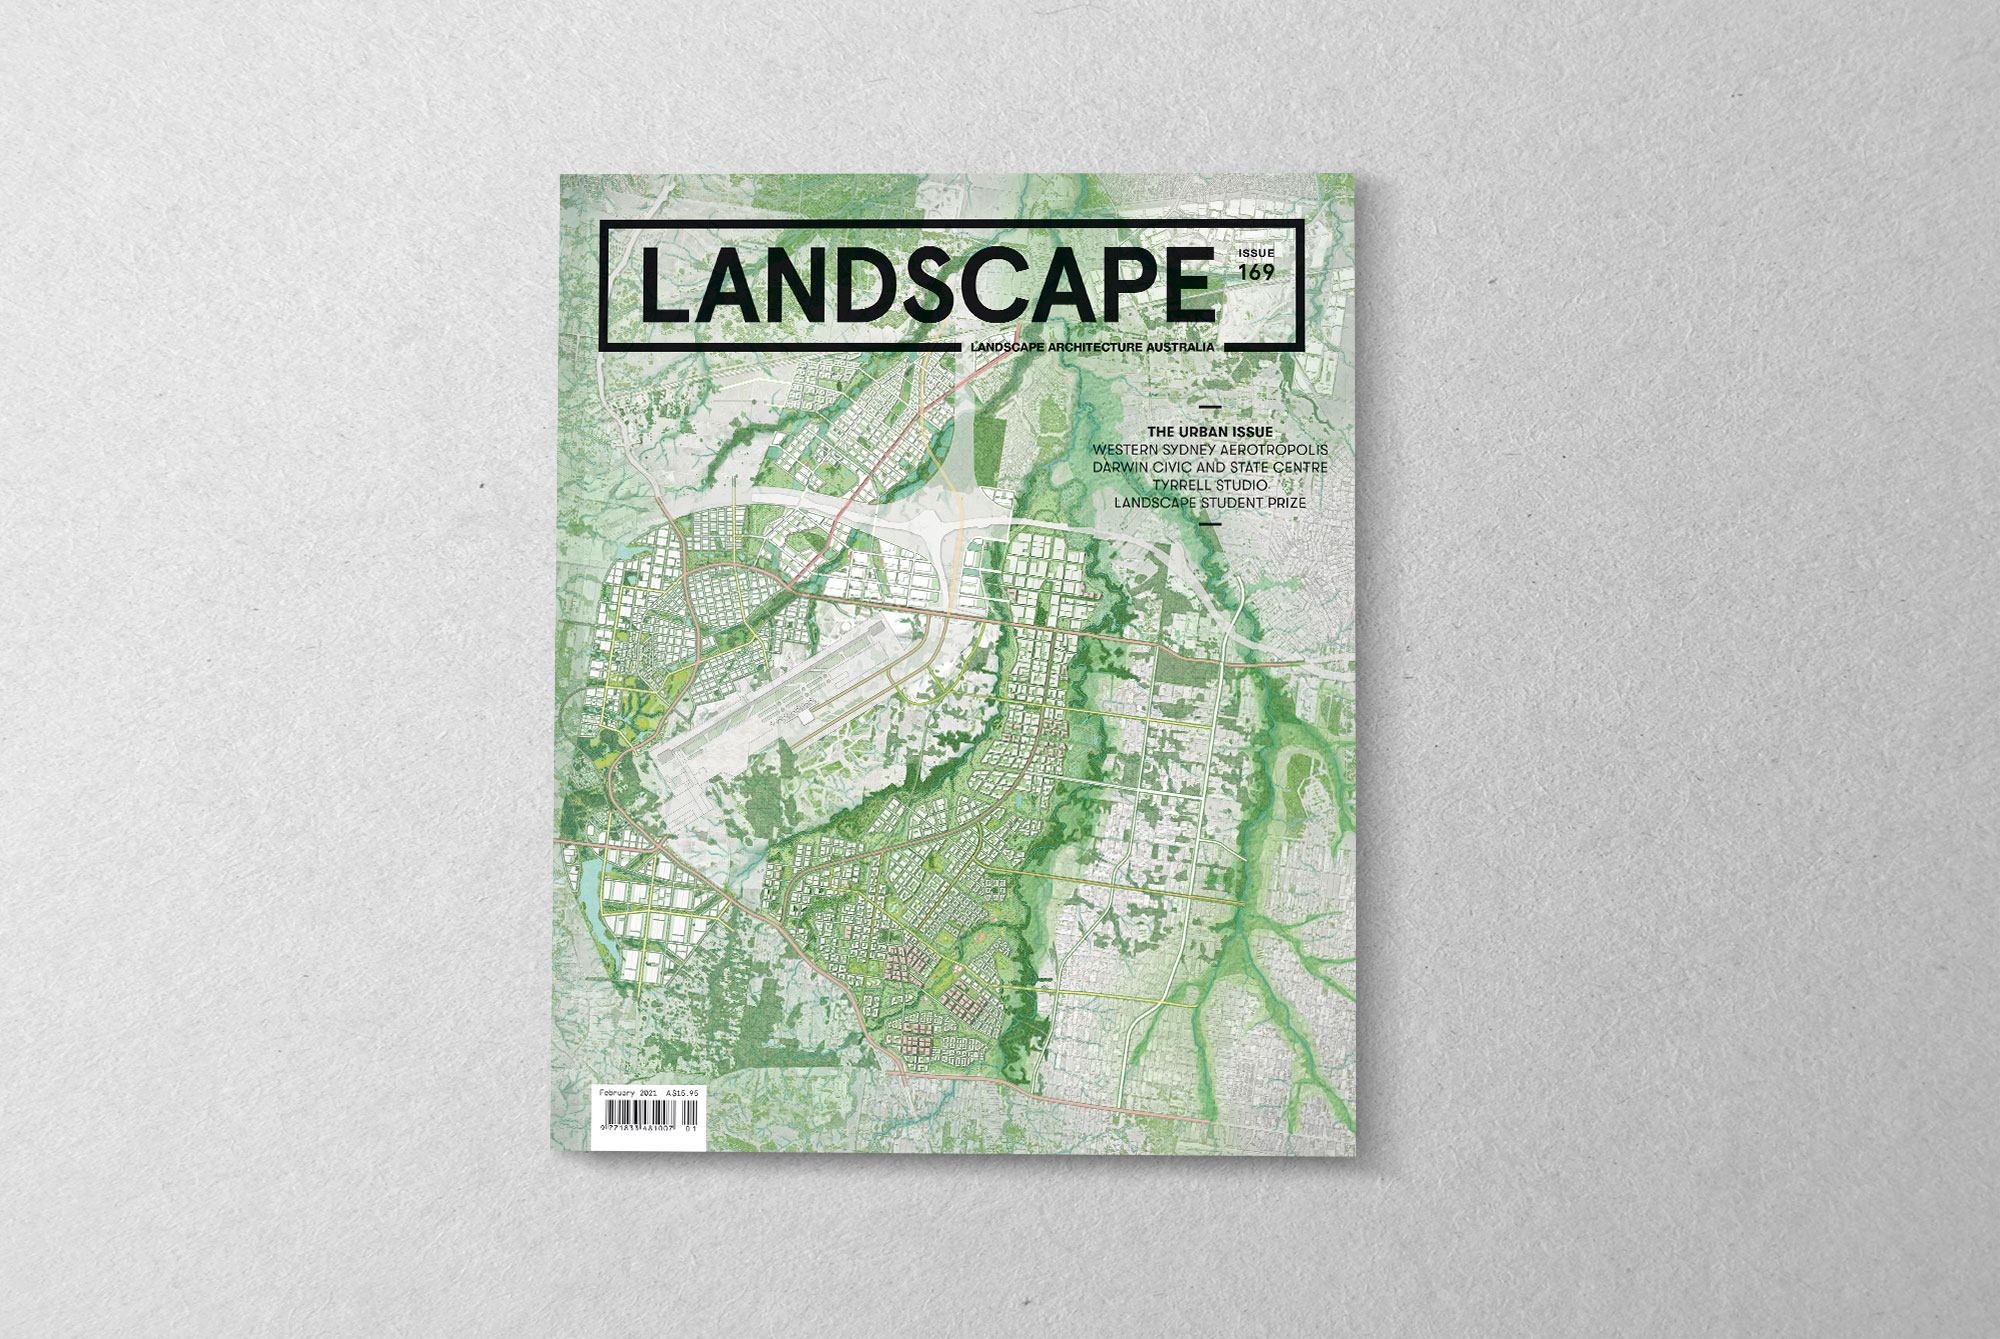 Landscape Architecture Australia is official magazine partner of the Australian Institute of Landscape Architects.